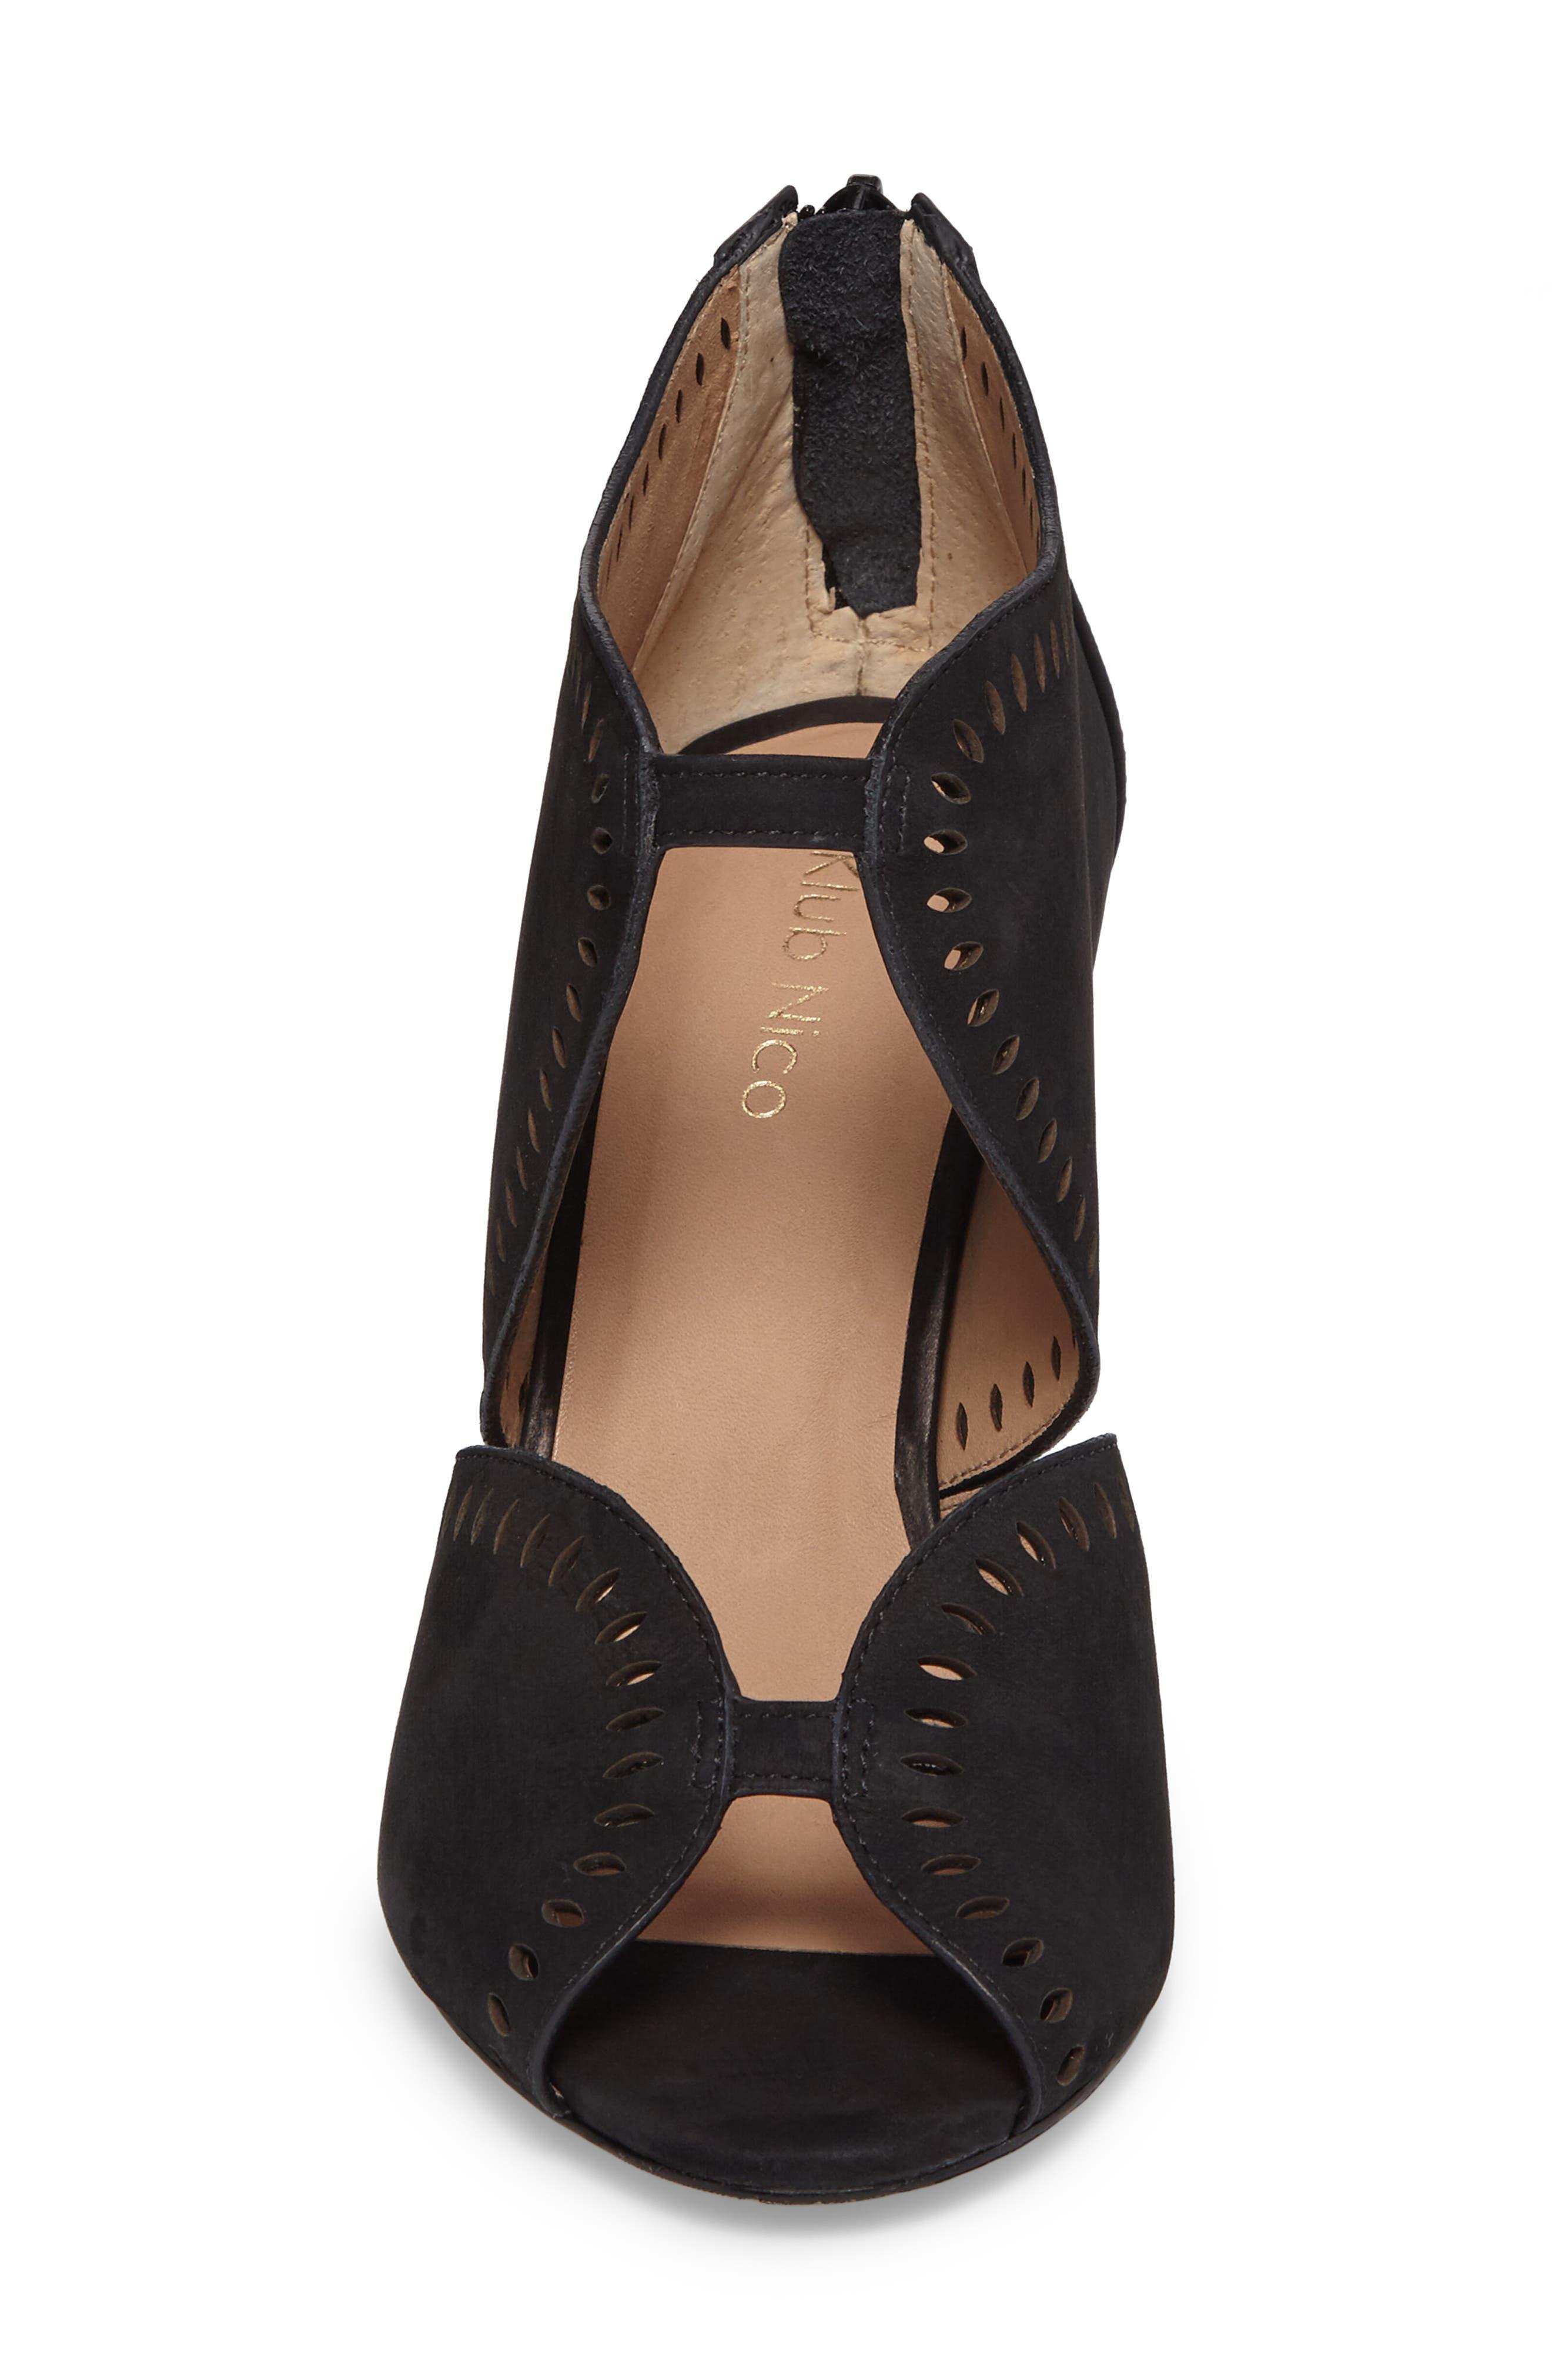 Mallia Perforated Sandal,                             Alternate thumbnail 4, color,                             001